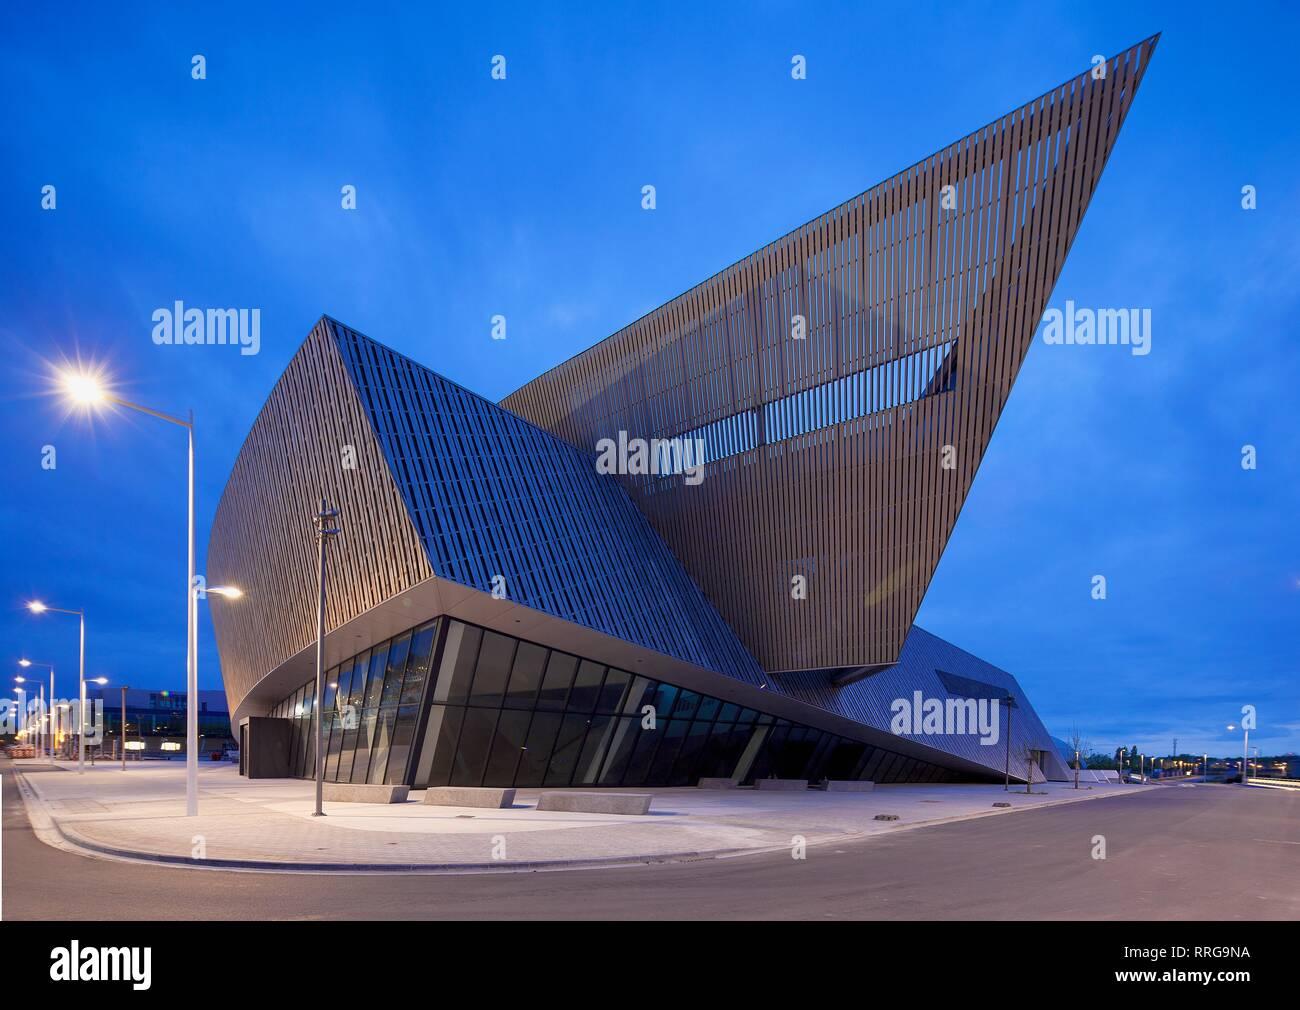 Le Manege Theatre, Mons, Wallonia, Belgium, Europe Stock Photo